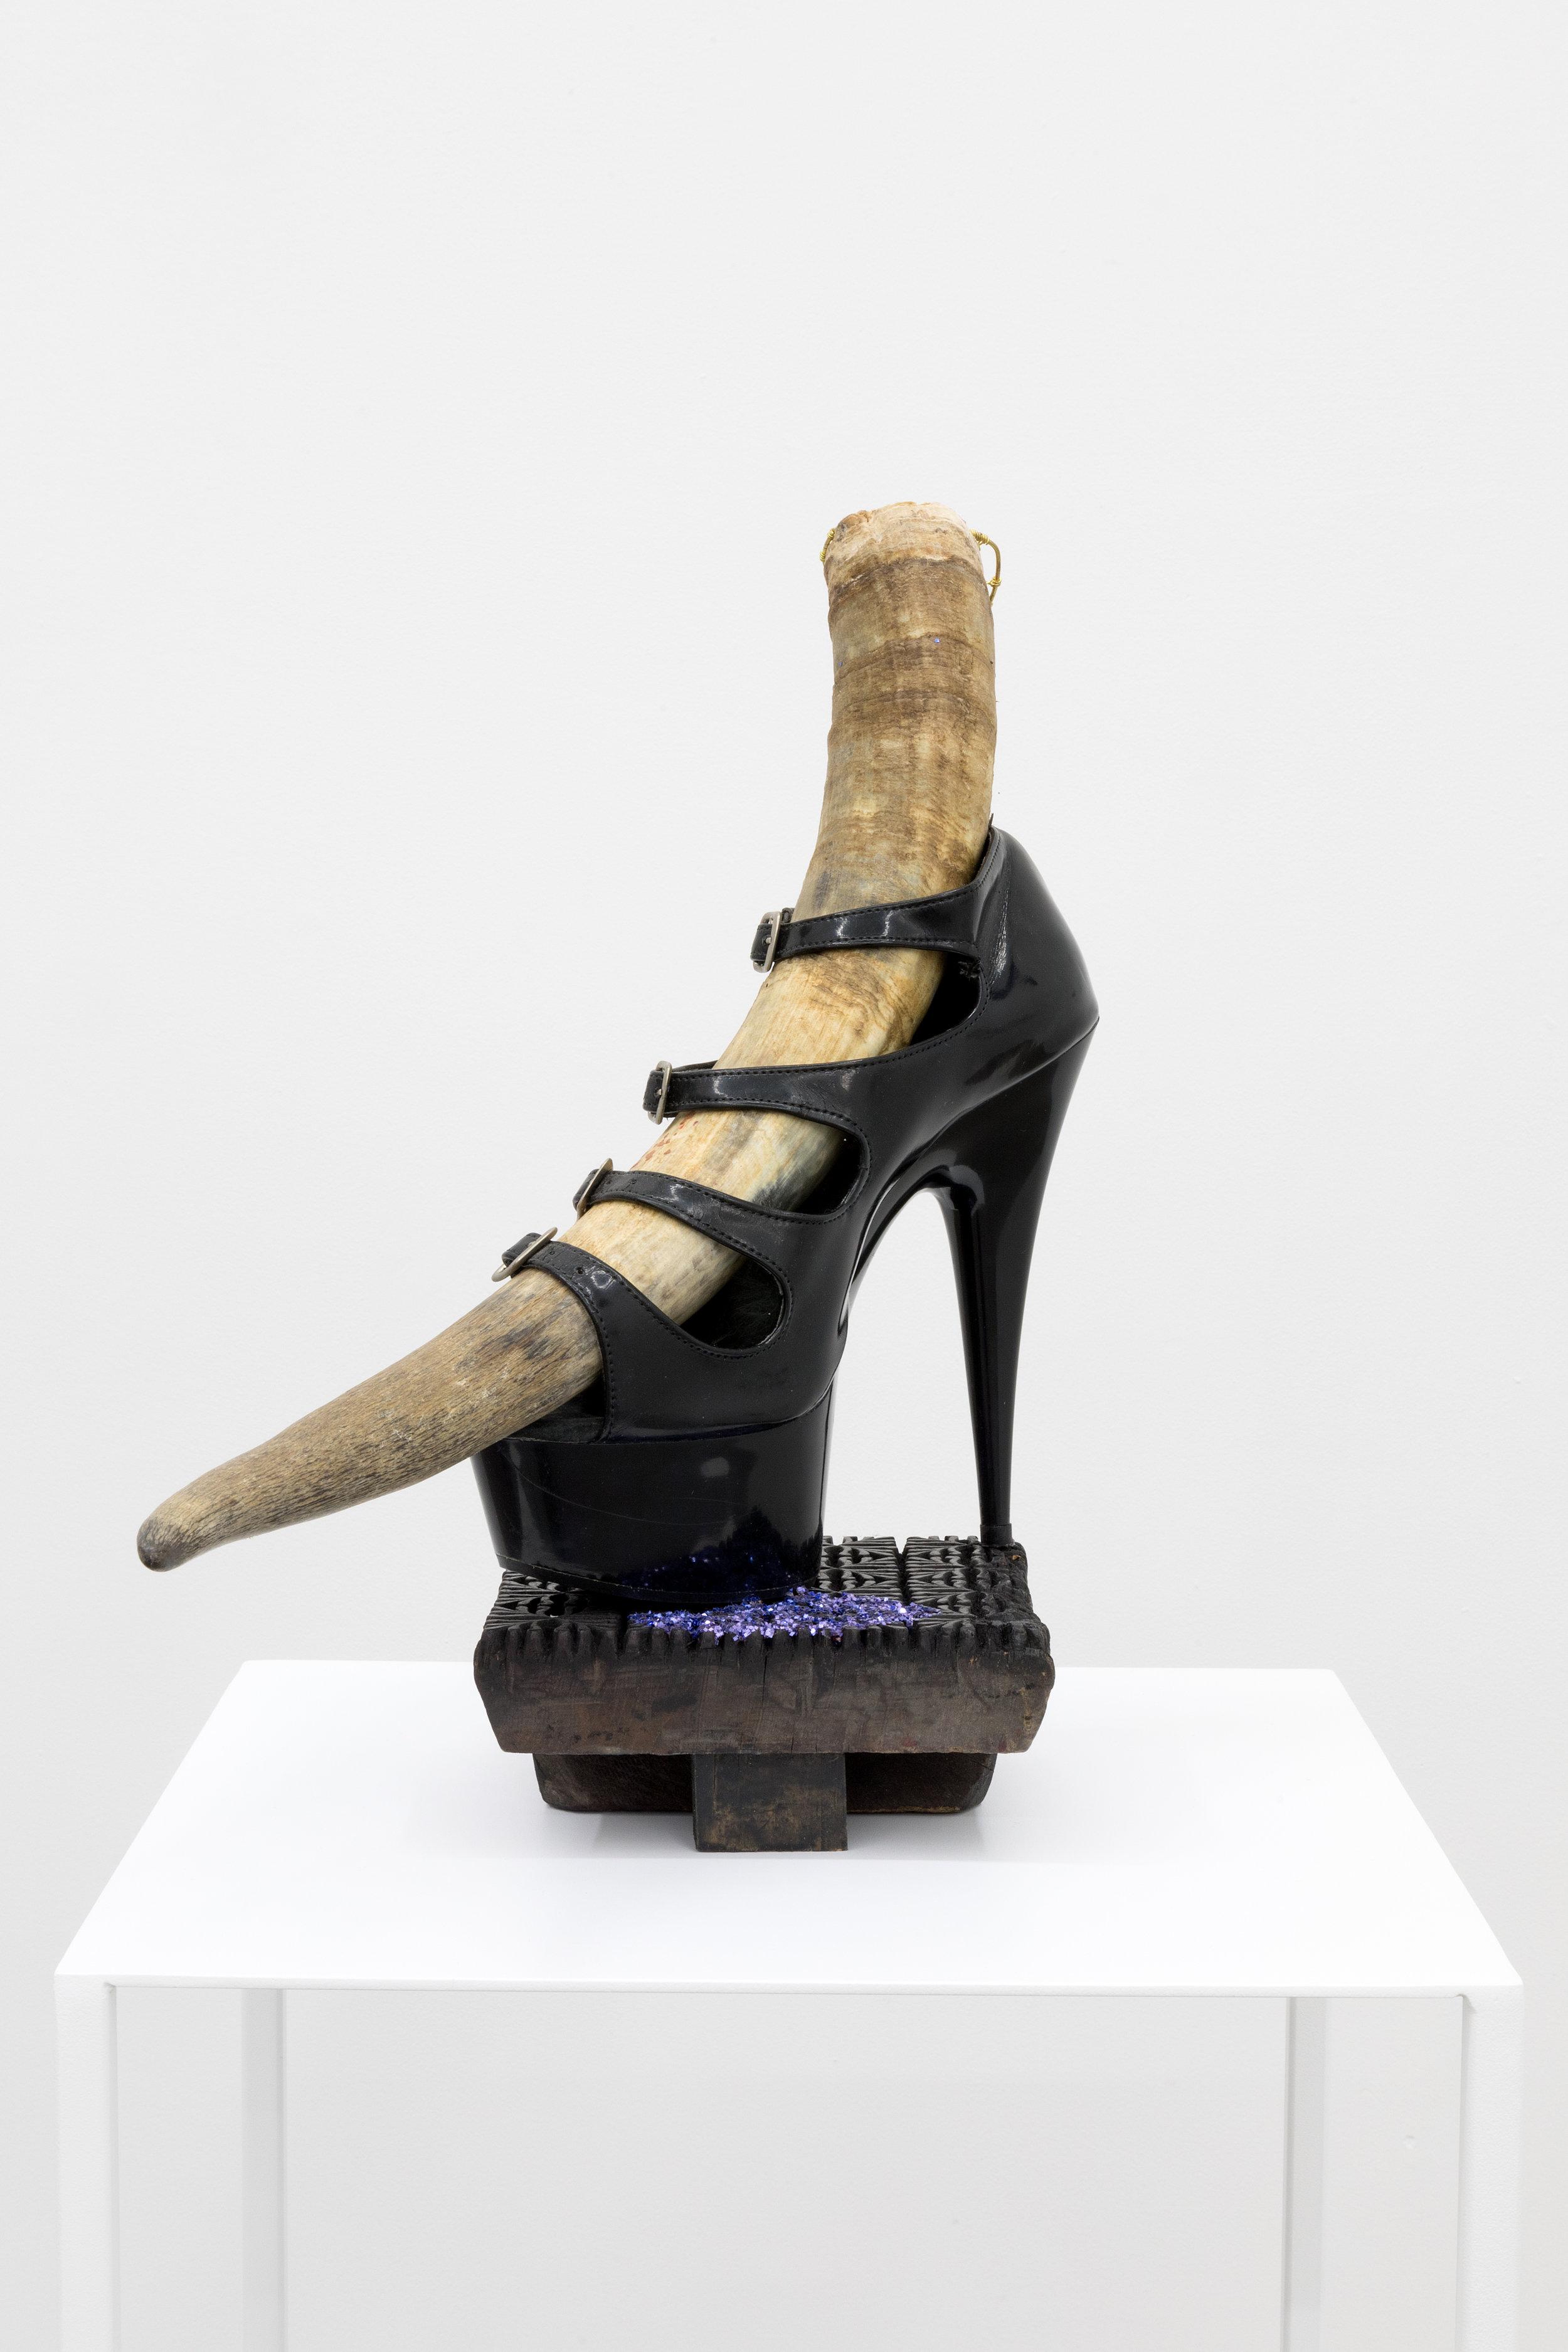 Genesis BREYER P-ORRIDGE,  Shoe Horn #4